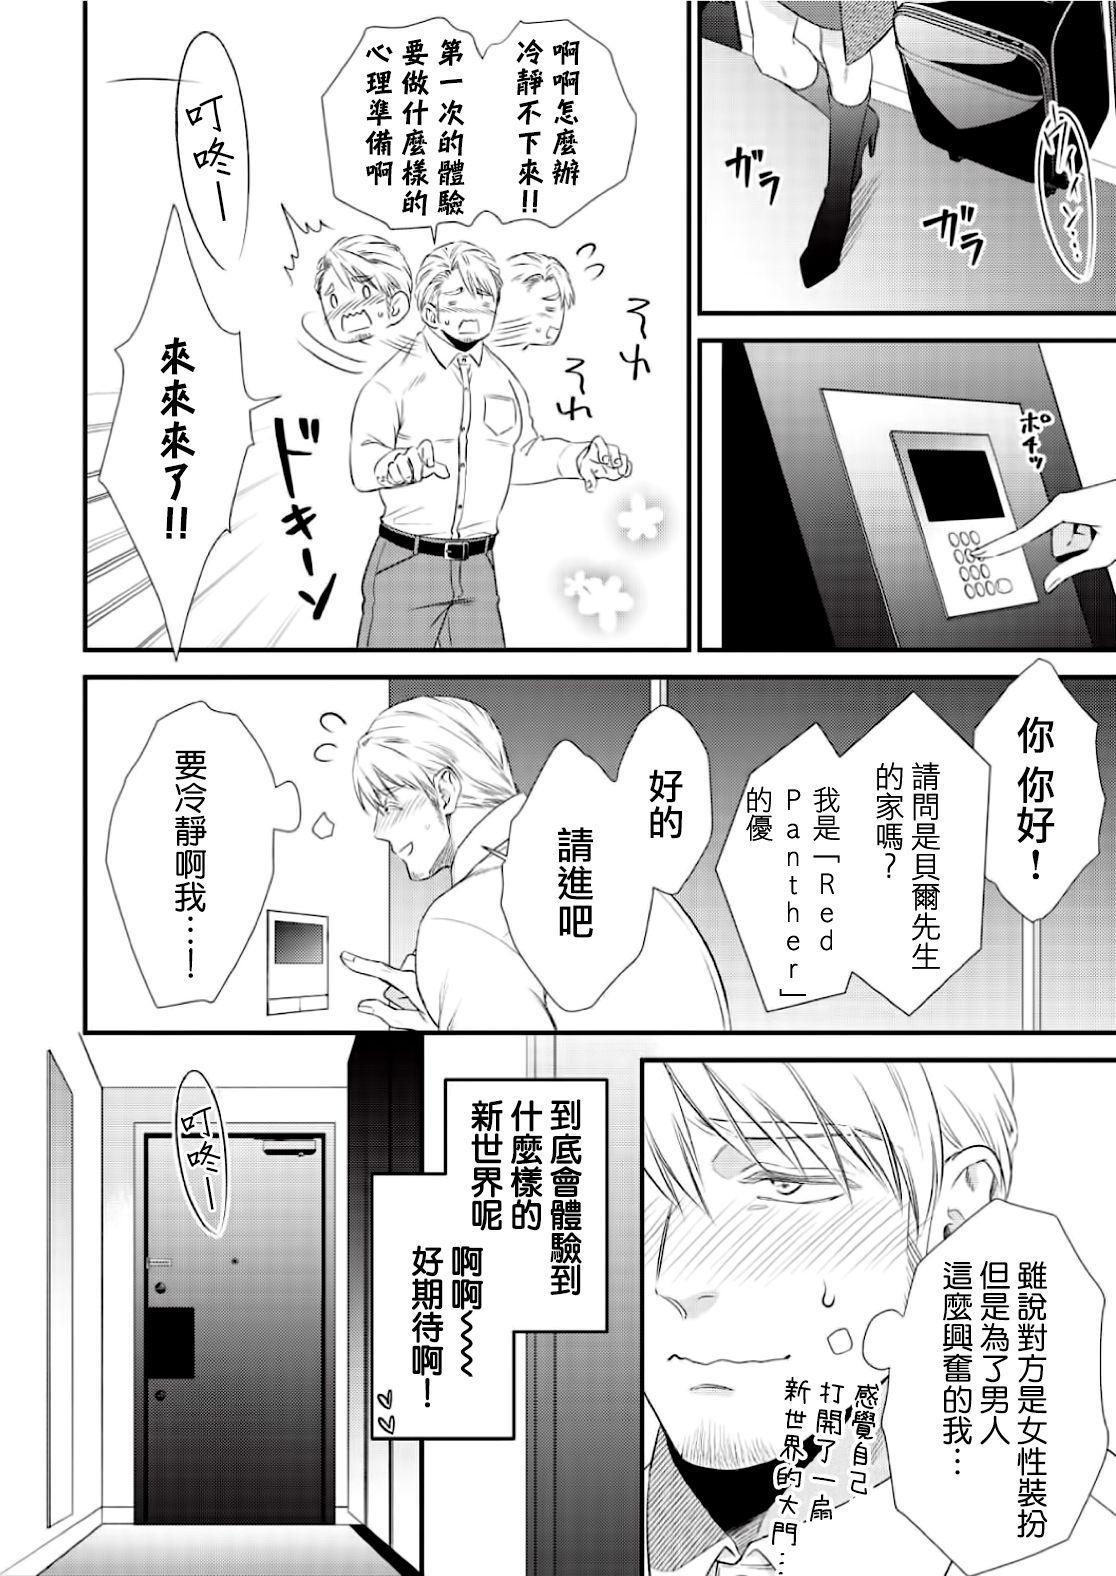 [Aion Kiu] Ijimete Kudasai Omega-sama ch.1-2 [Chinese] [沒有漢化] [Digital] 14